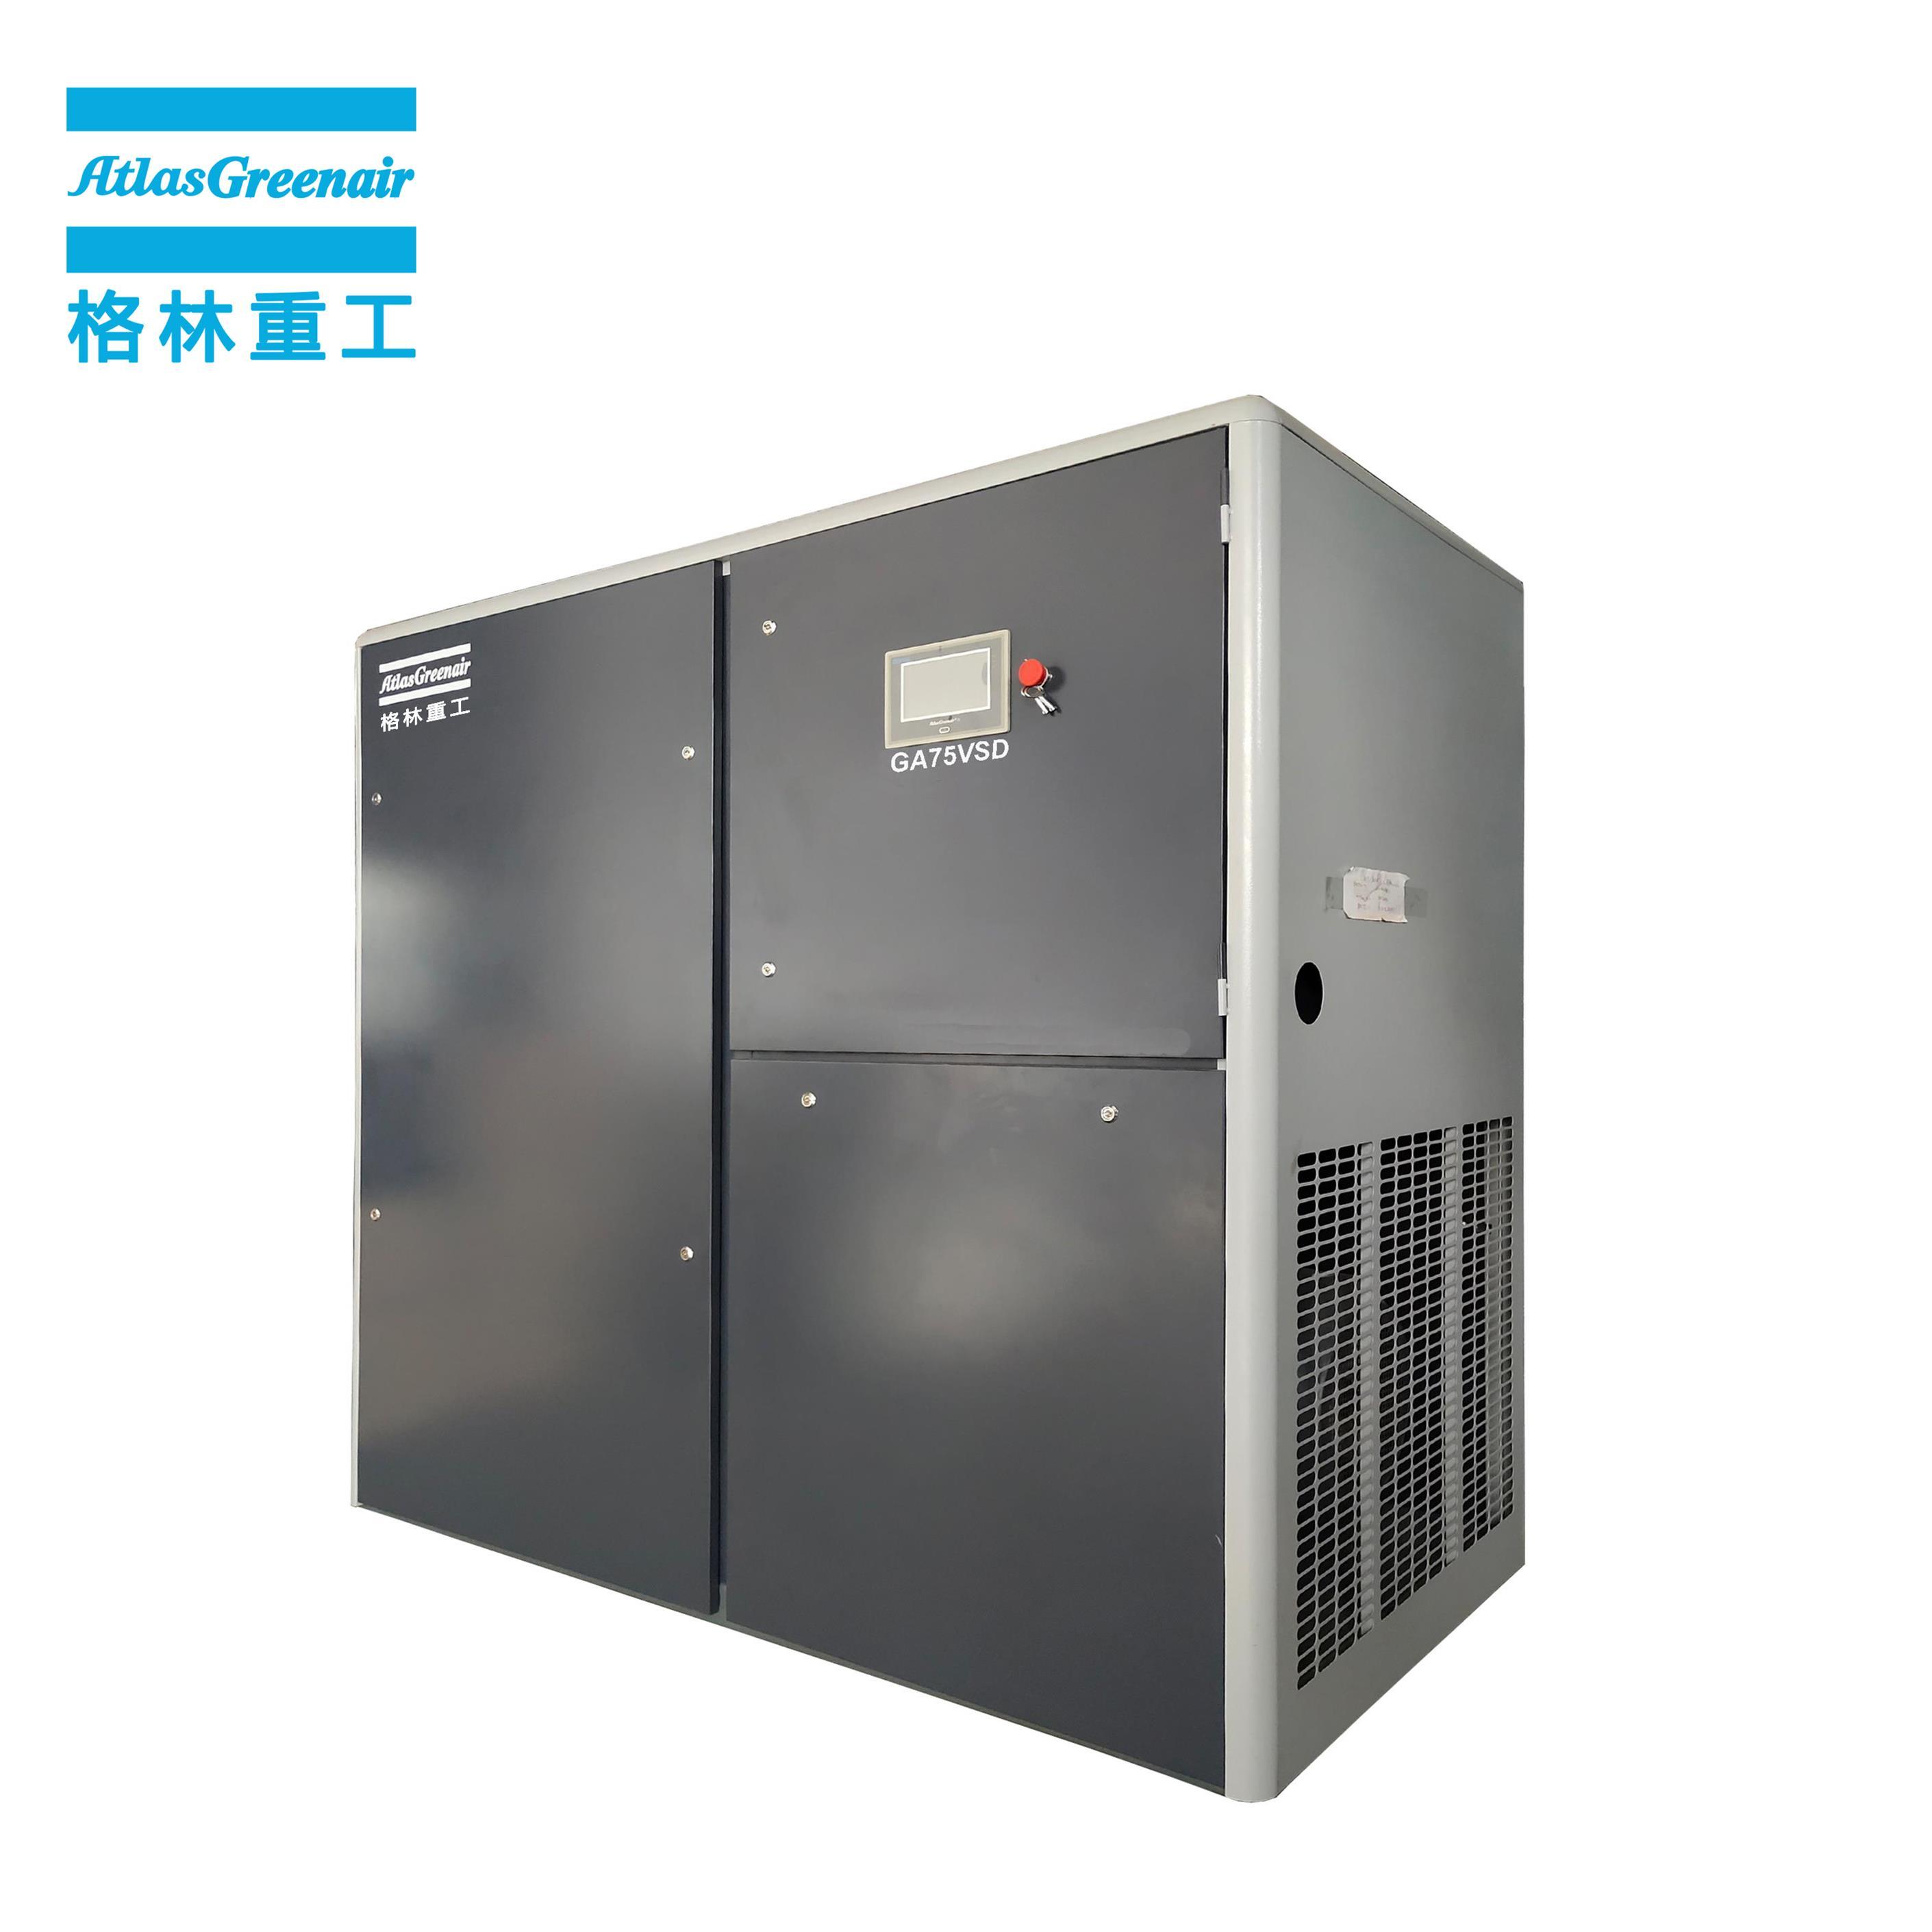 Atlas Greenair Screw Air Compressor new variable speed air compressor factory for sale-1